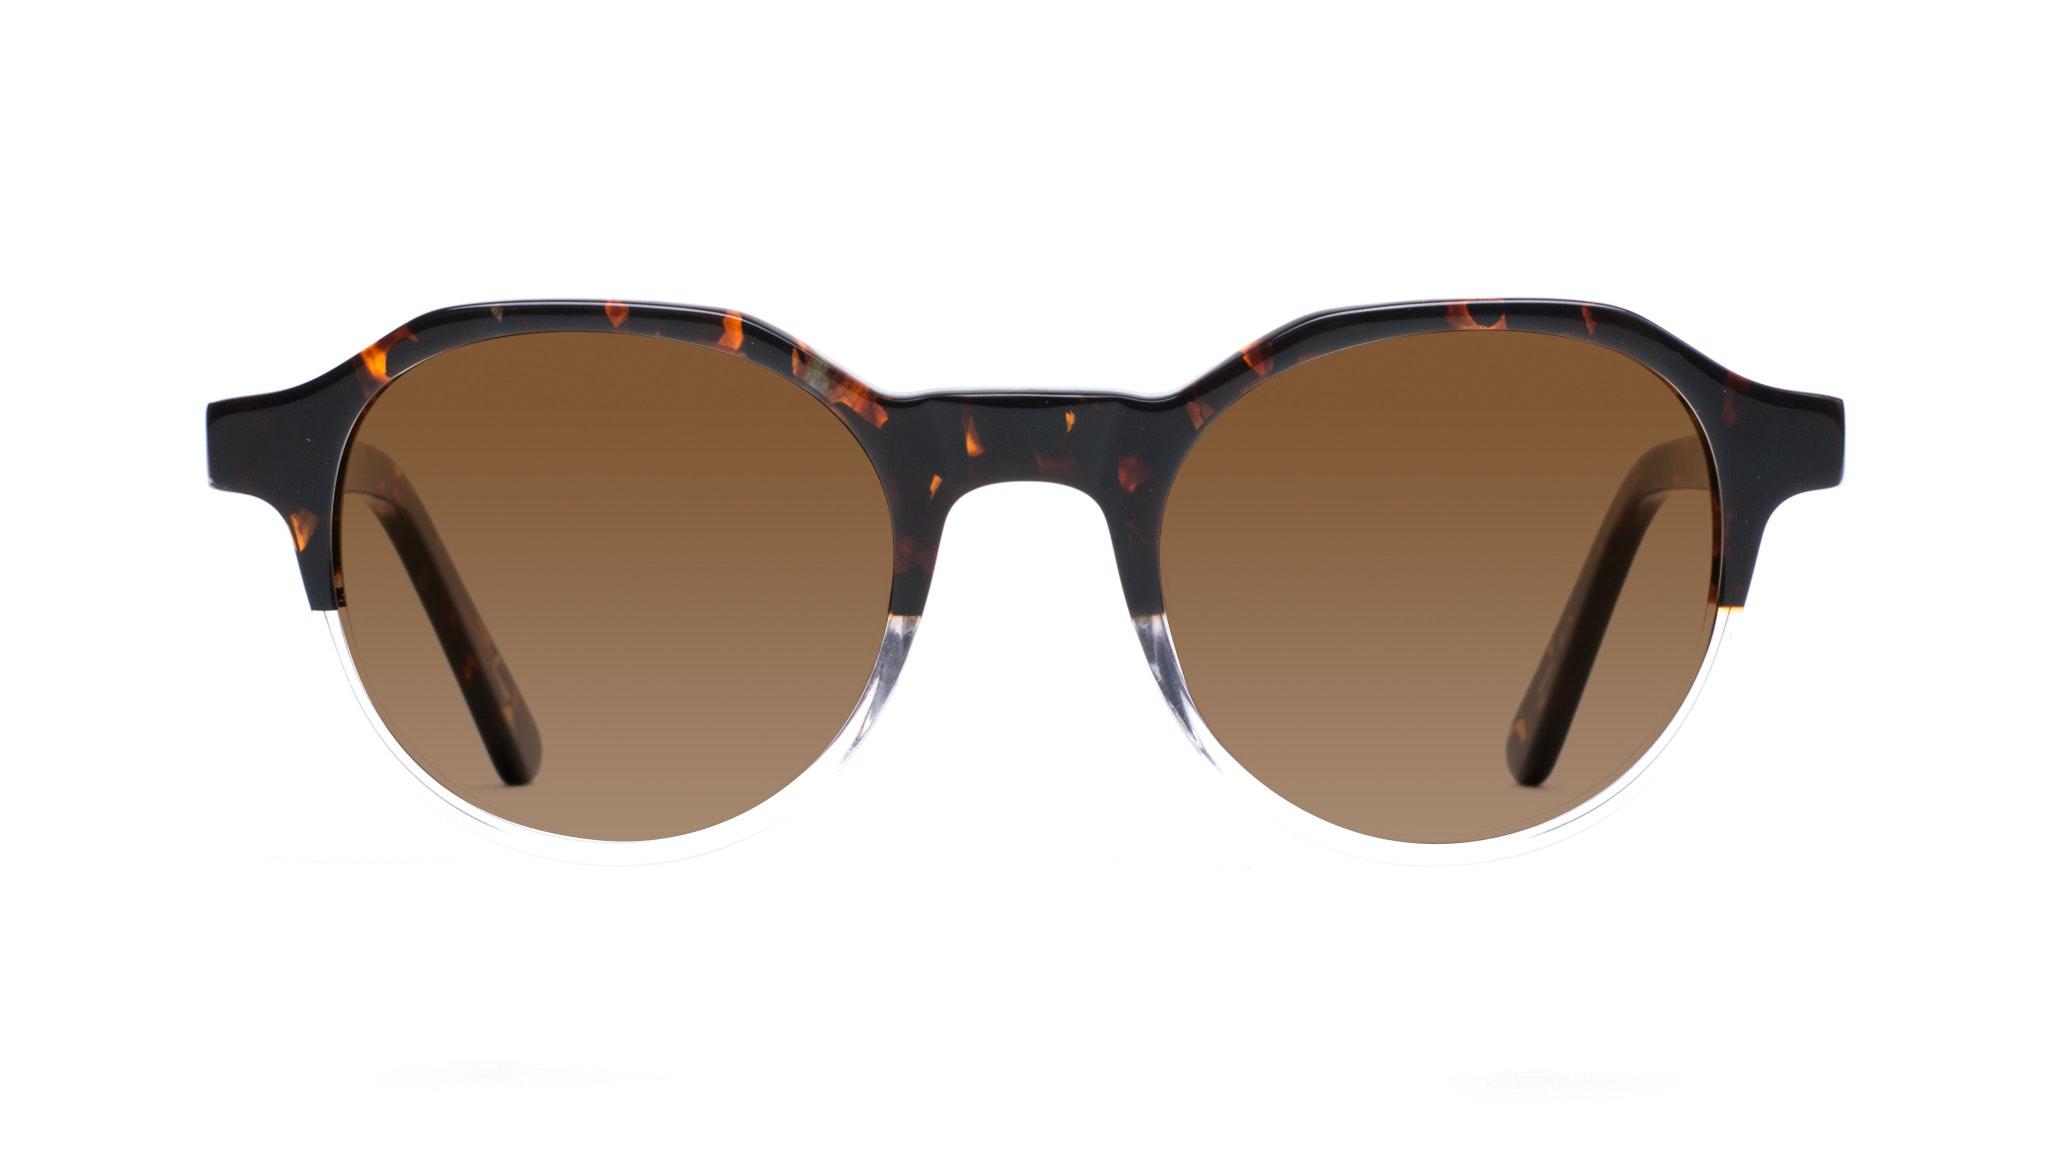 Affordable Fashion Glasses Round Sunglasses Men Form Mahogany Clear